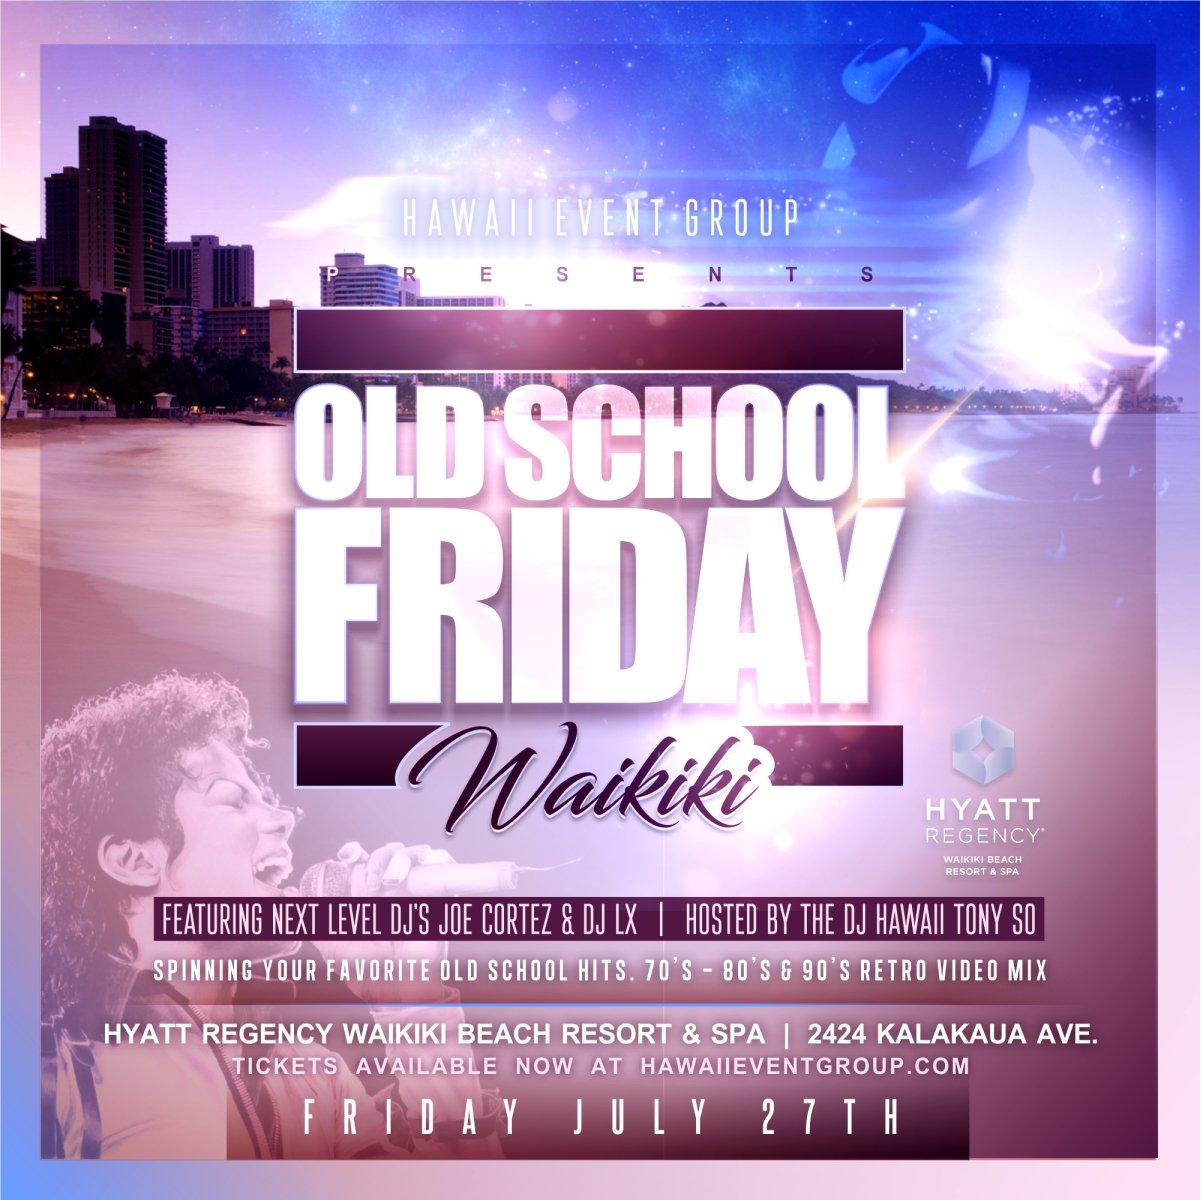 Old School Friday Waikiki 80's Video Mix | HAWAII EVENT GROUP